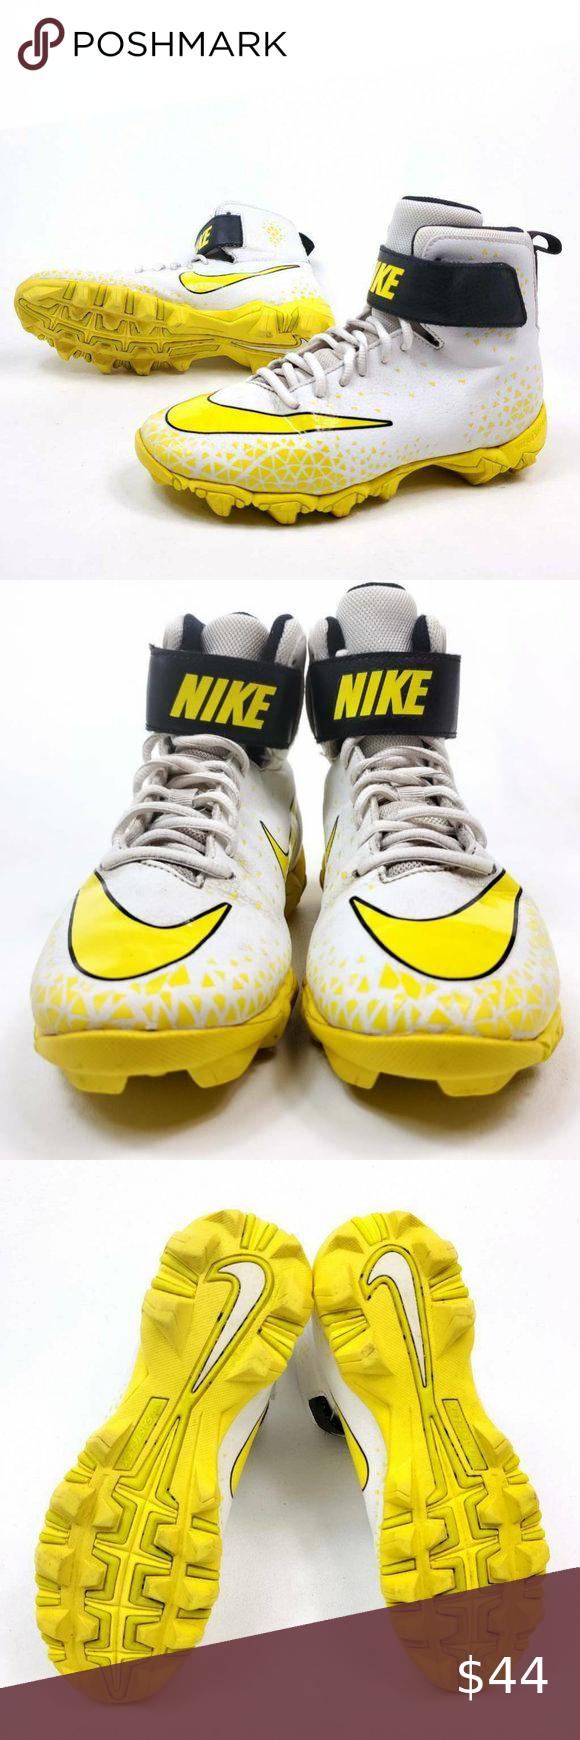 us 5y shoe size